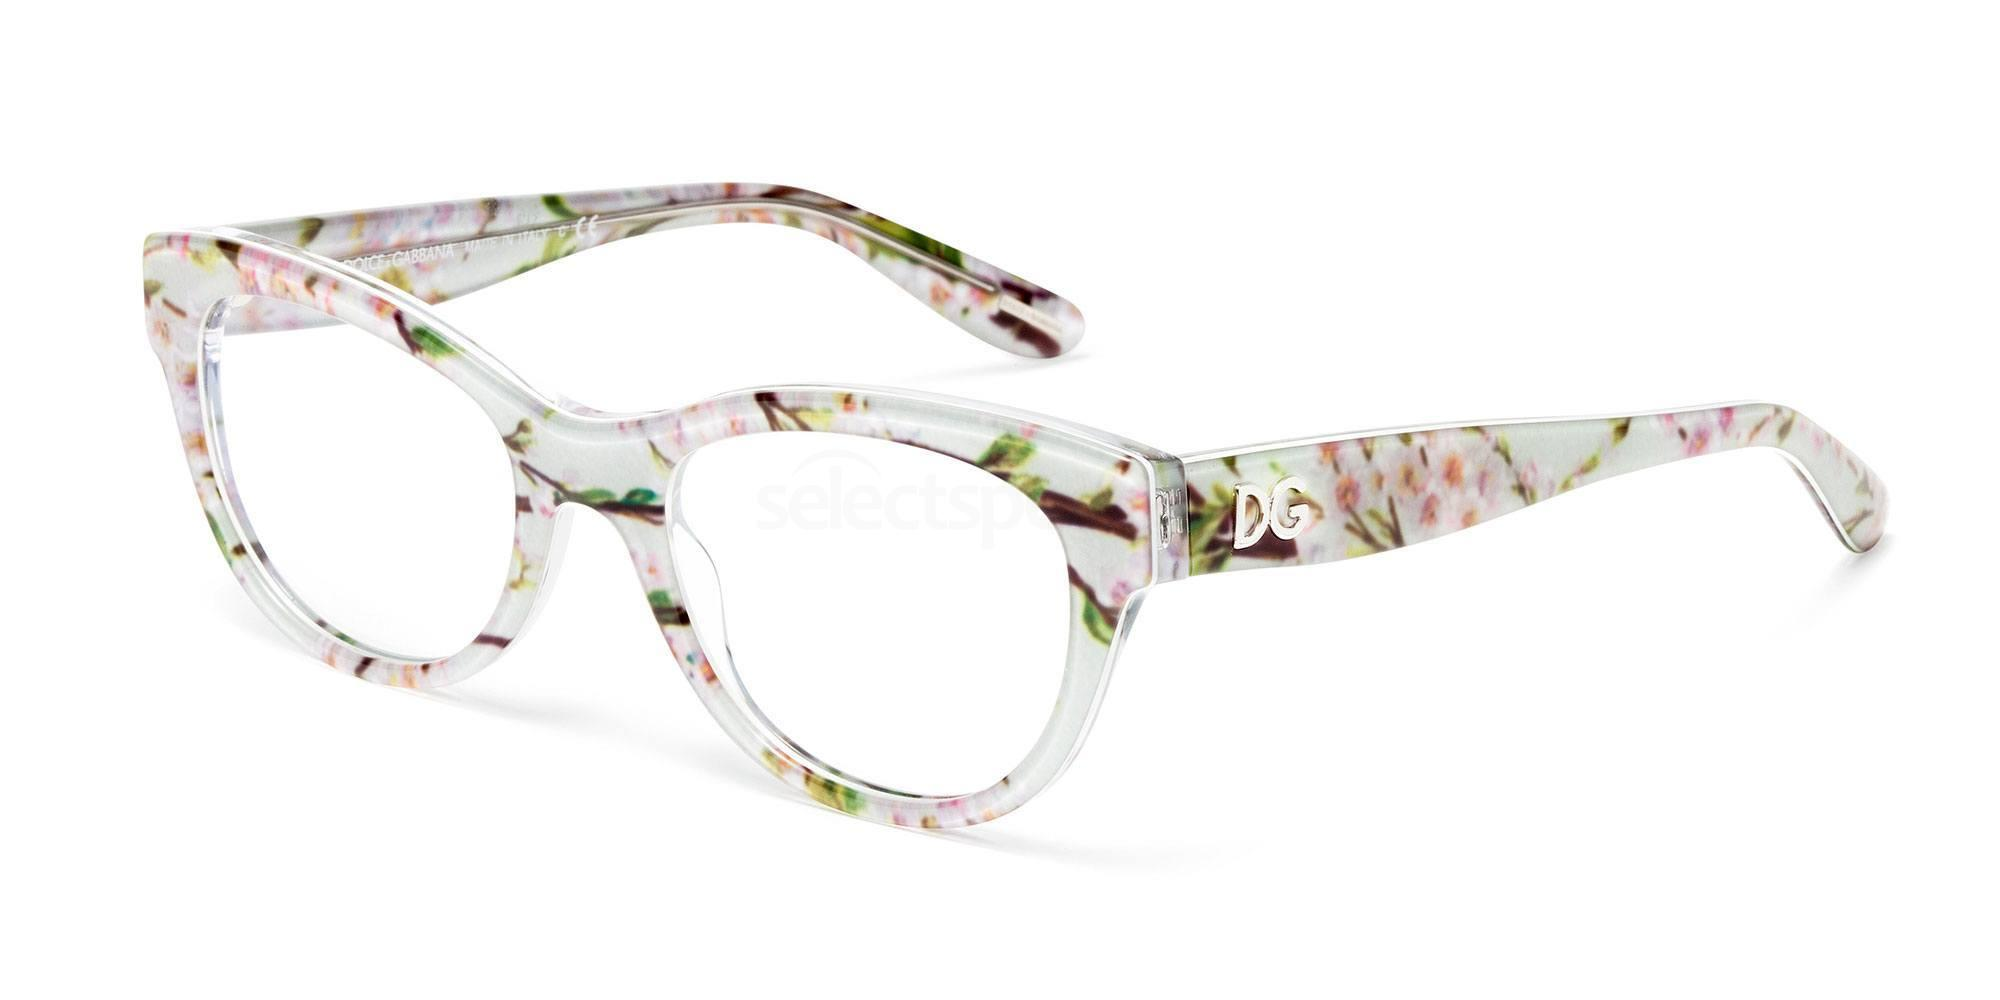 Dolce & Gabbana DG3203 ALMOND FLOWERS